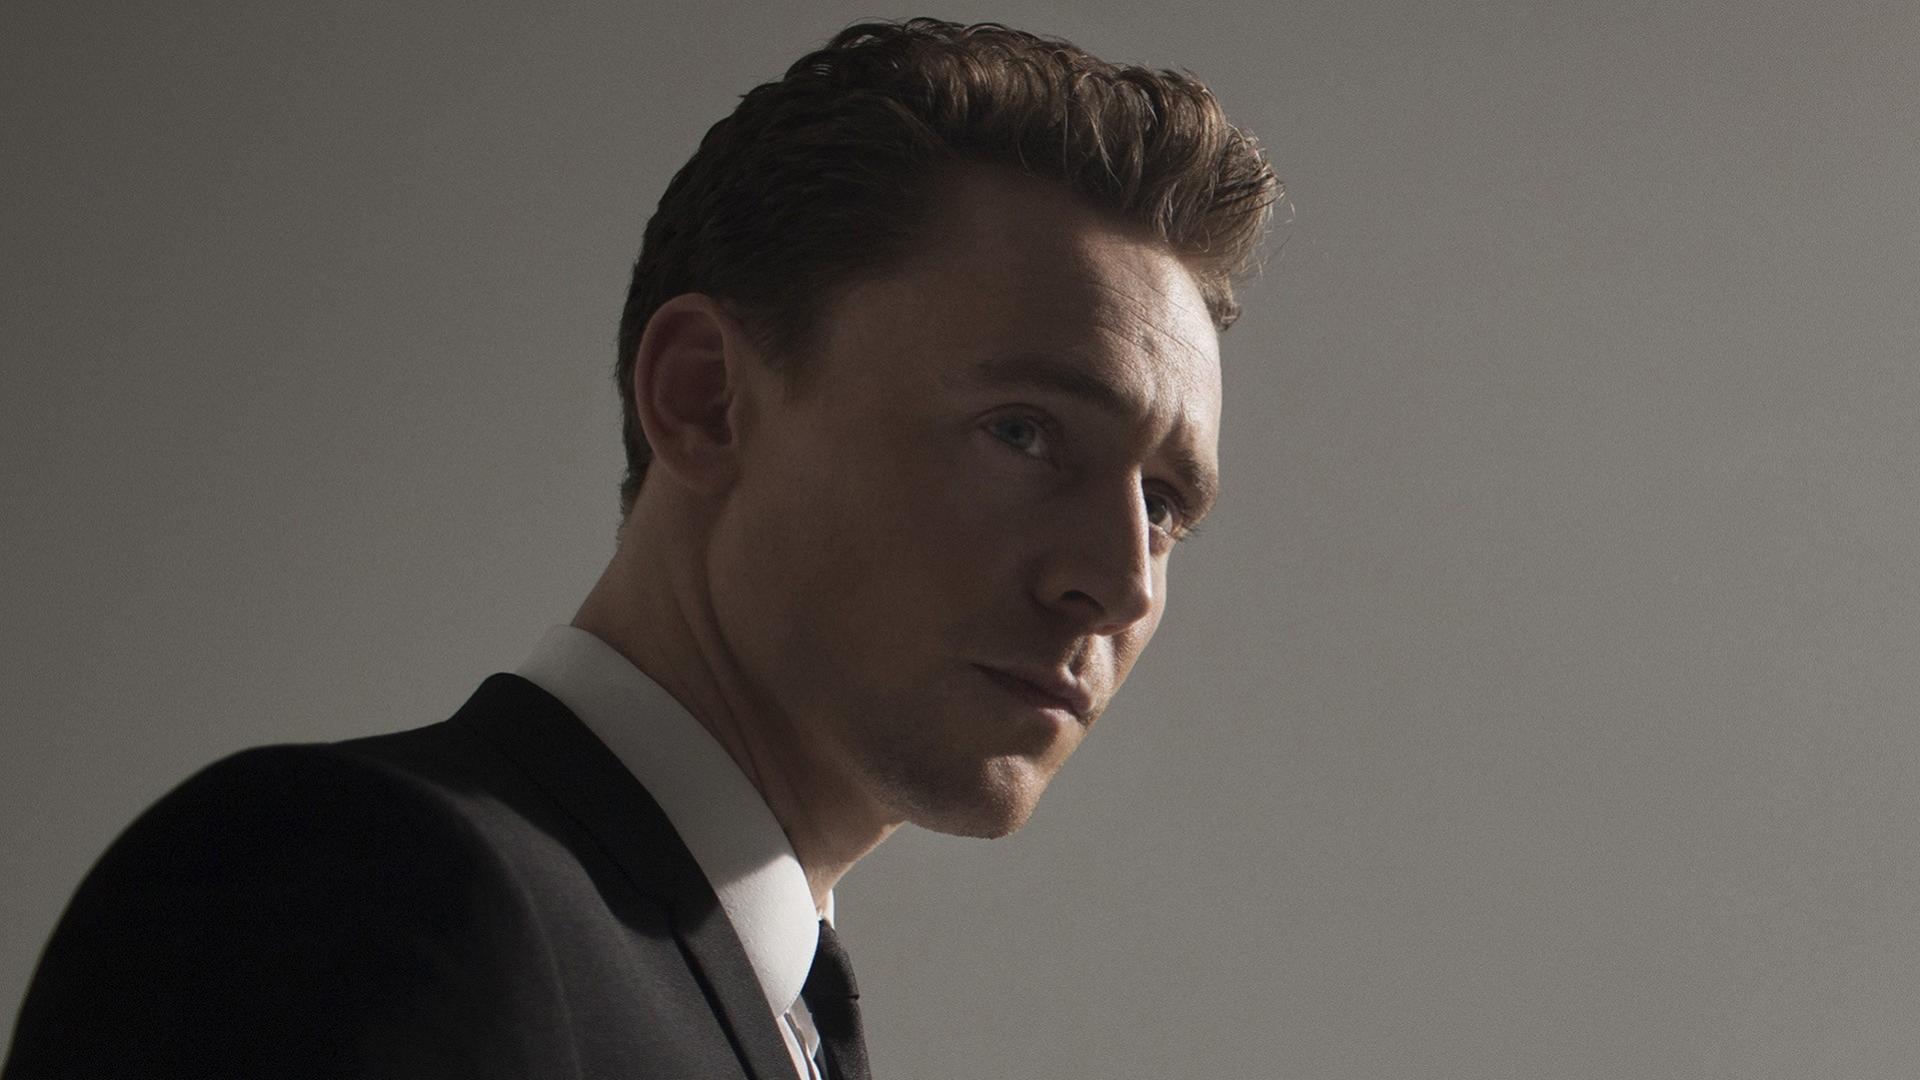 Men actors british tom hiddleston grey background wallpaper 72824 1920x1080